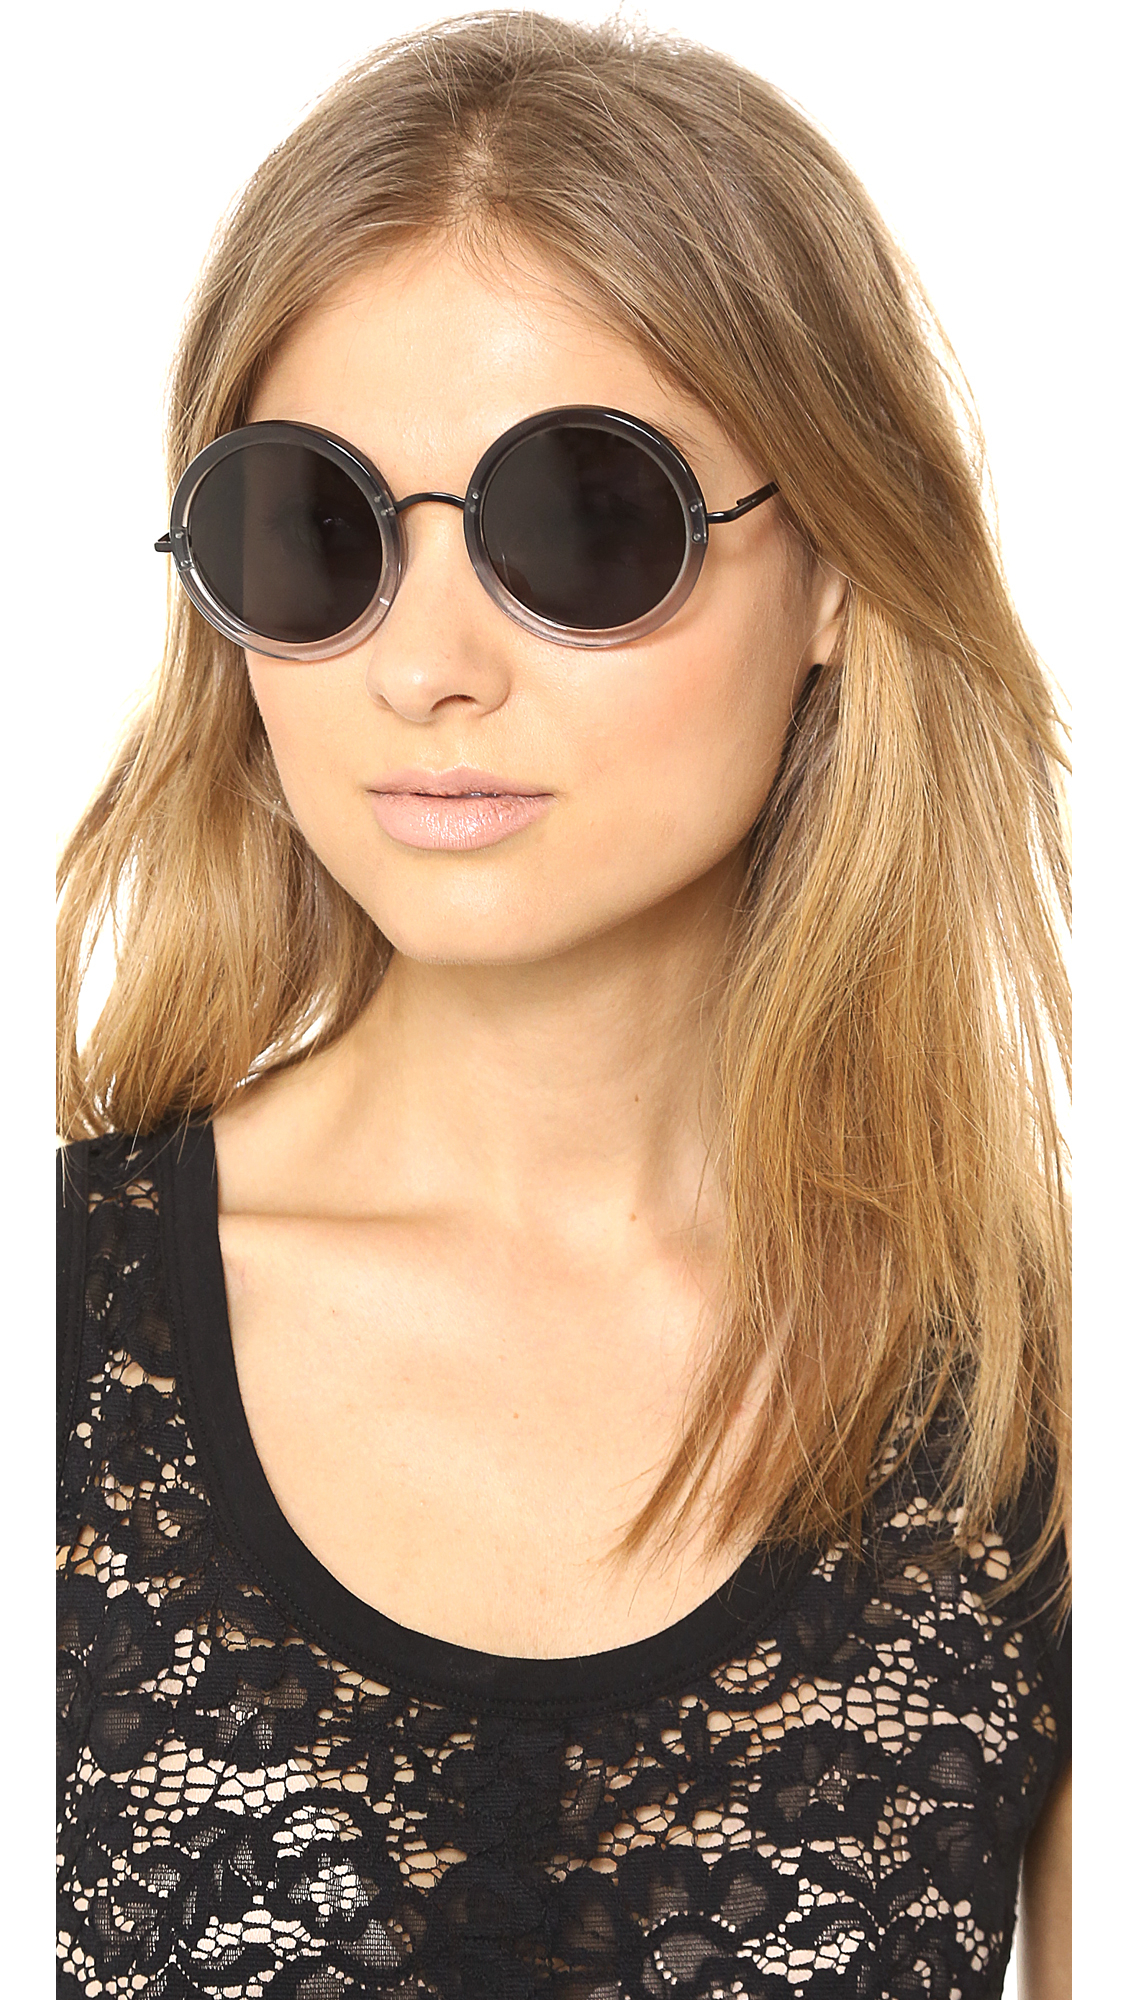 The Row Round Sunglasses The Best Sunglasses